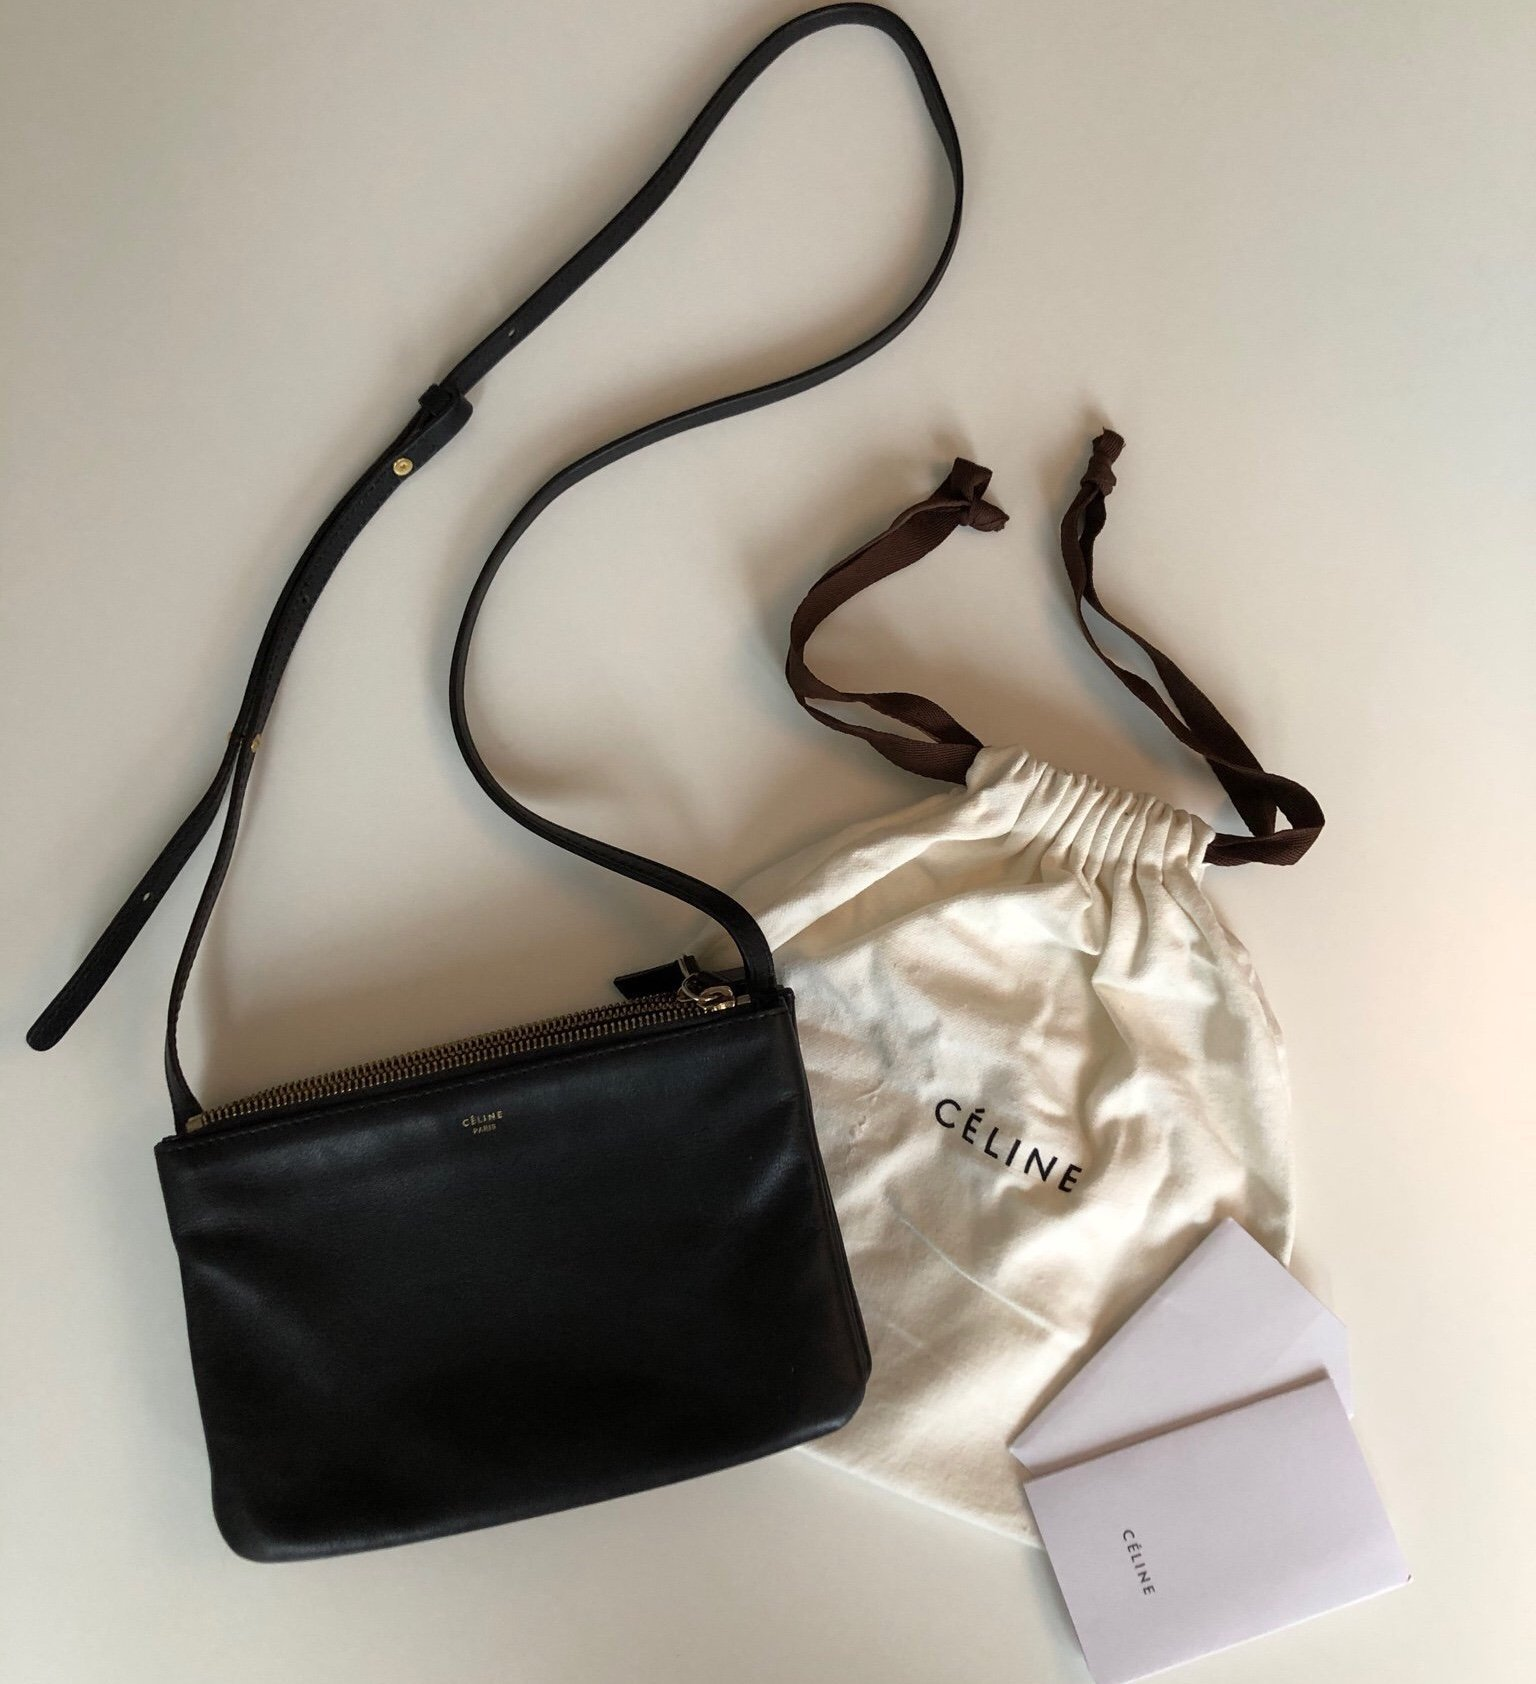 Céline trio bag size small